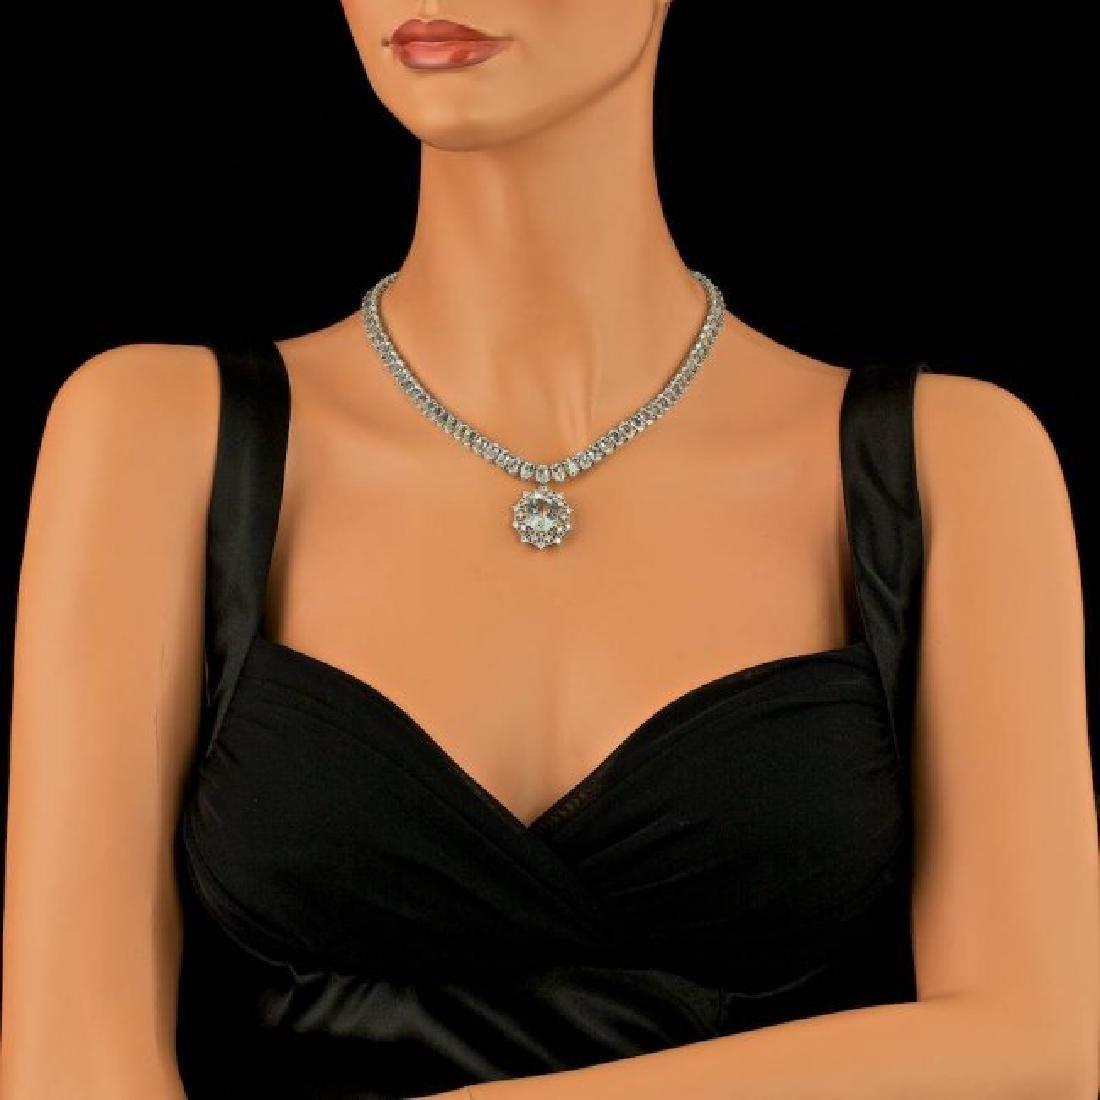 14k Gold 61ct Aquamarine 1.40ct Diamond Necklace - 3